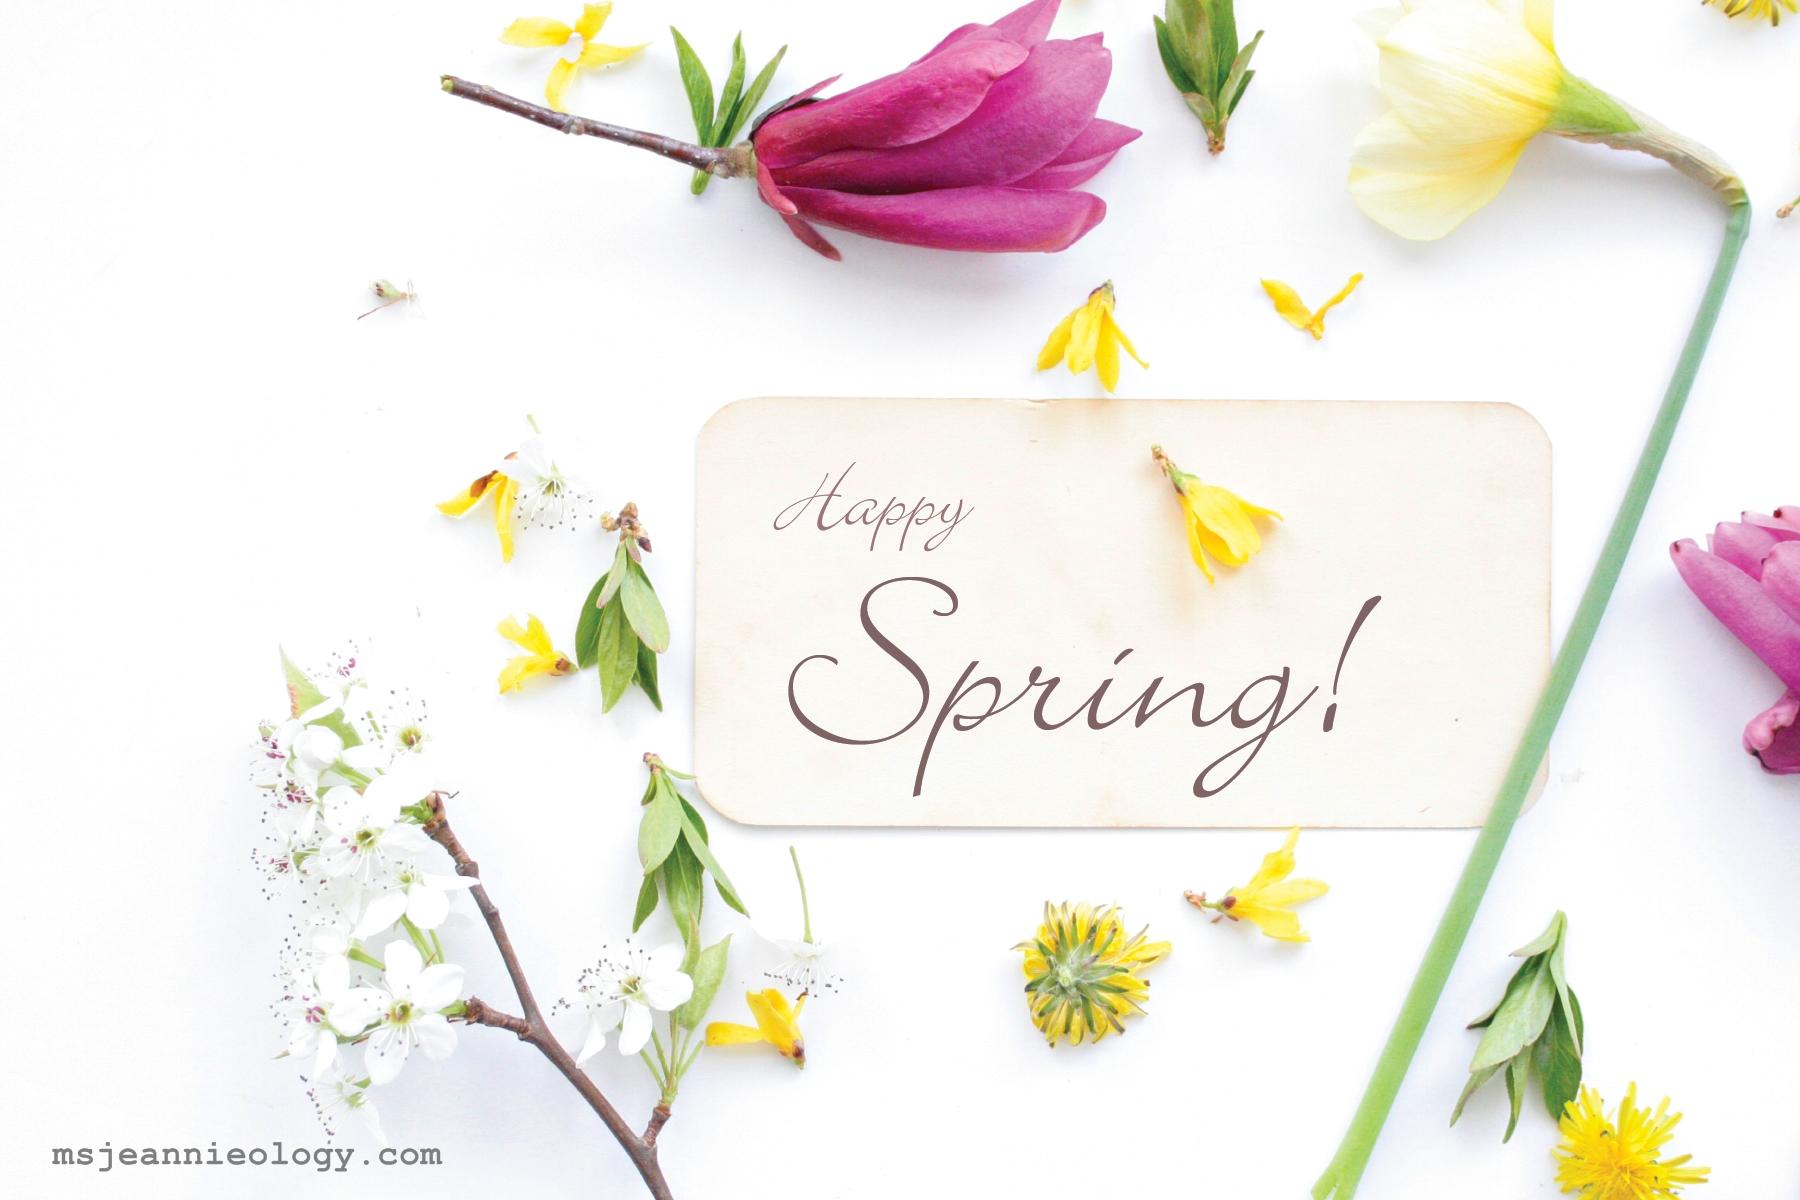 Happy Spring Day Wallpaper wwwpixsharkcom   Images 1800x1200